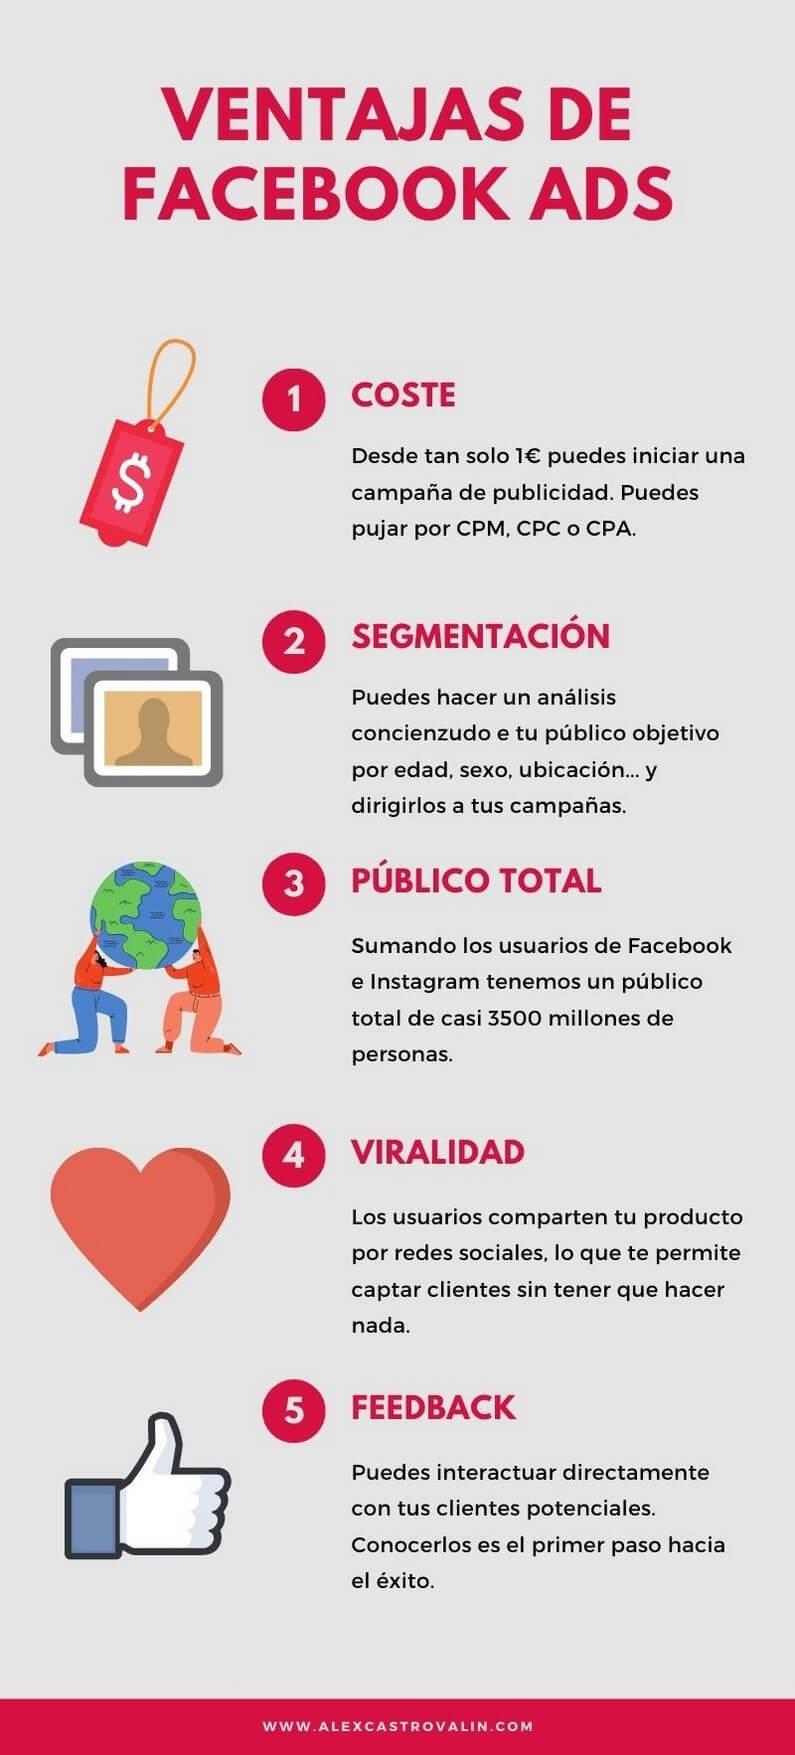 infografia ventajas facebook ads